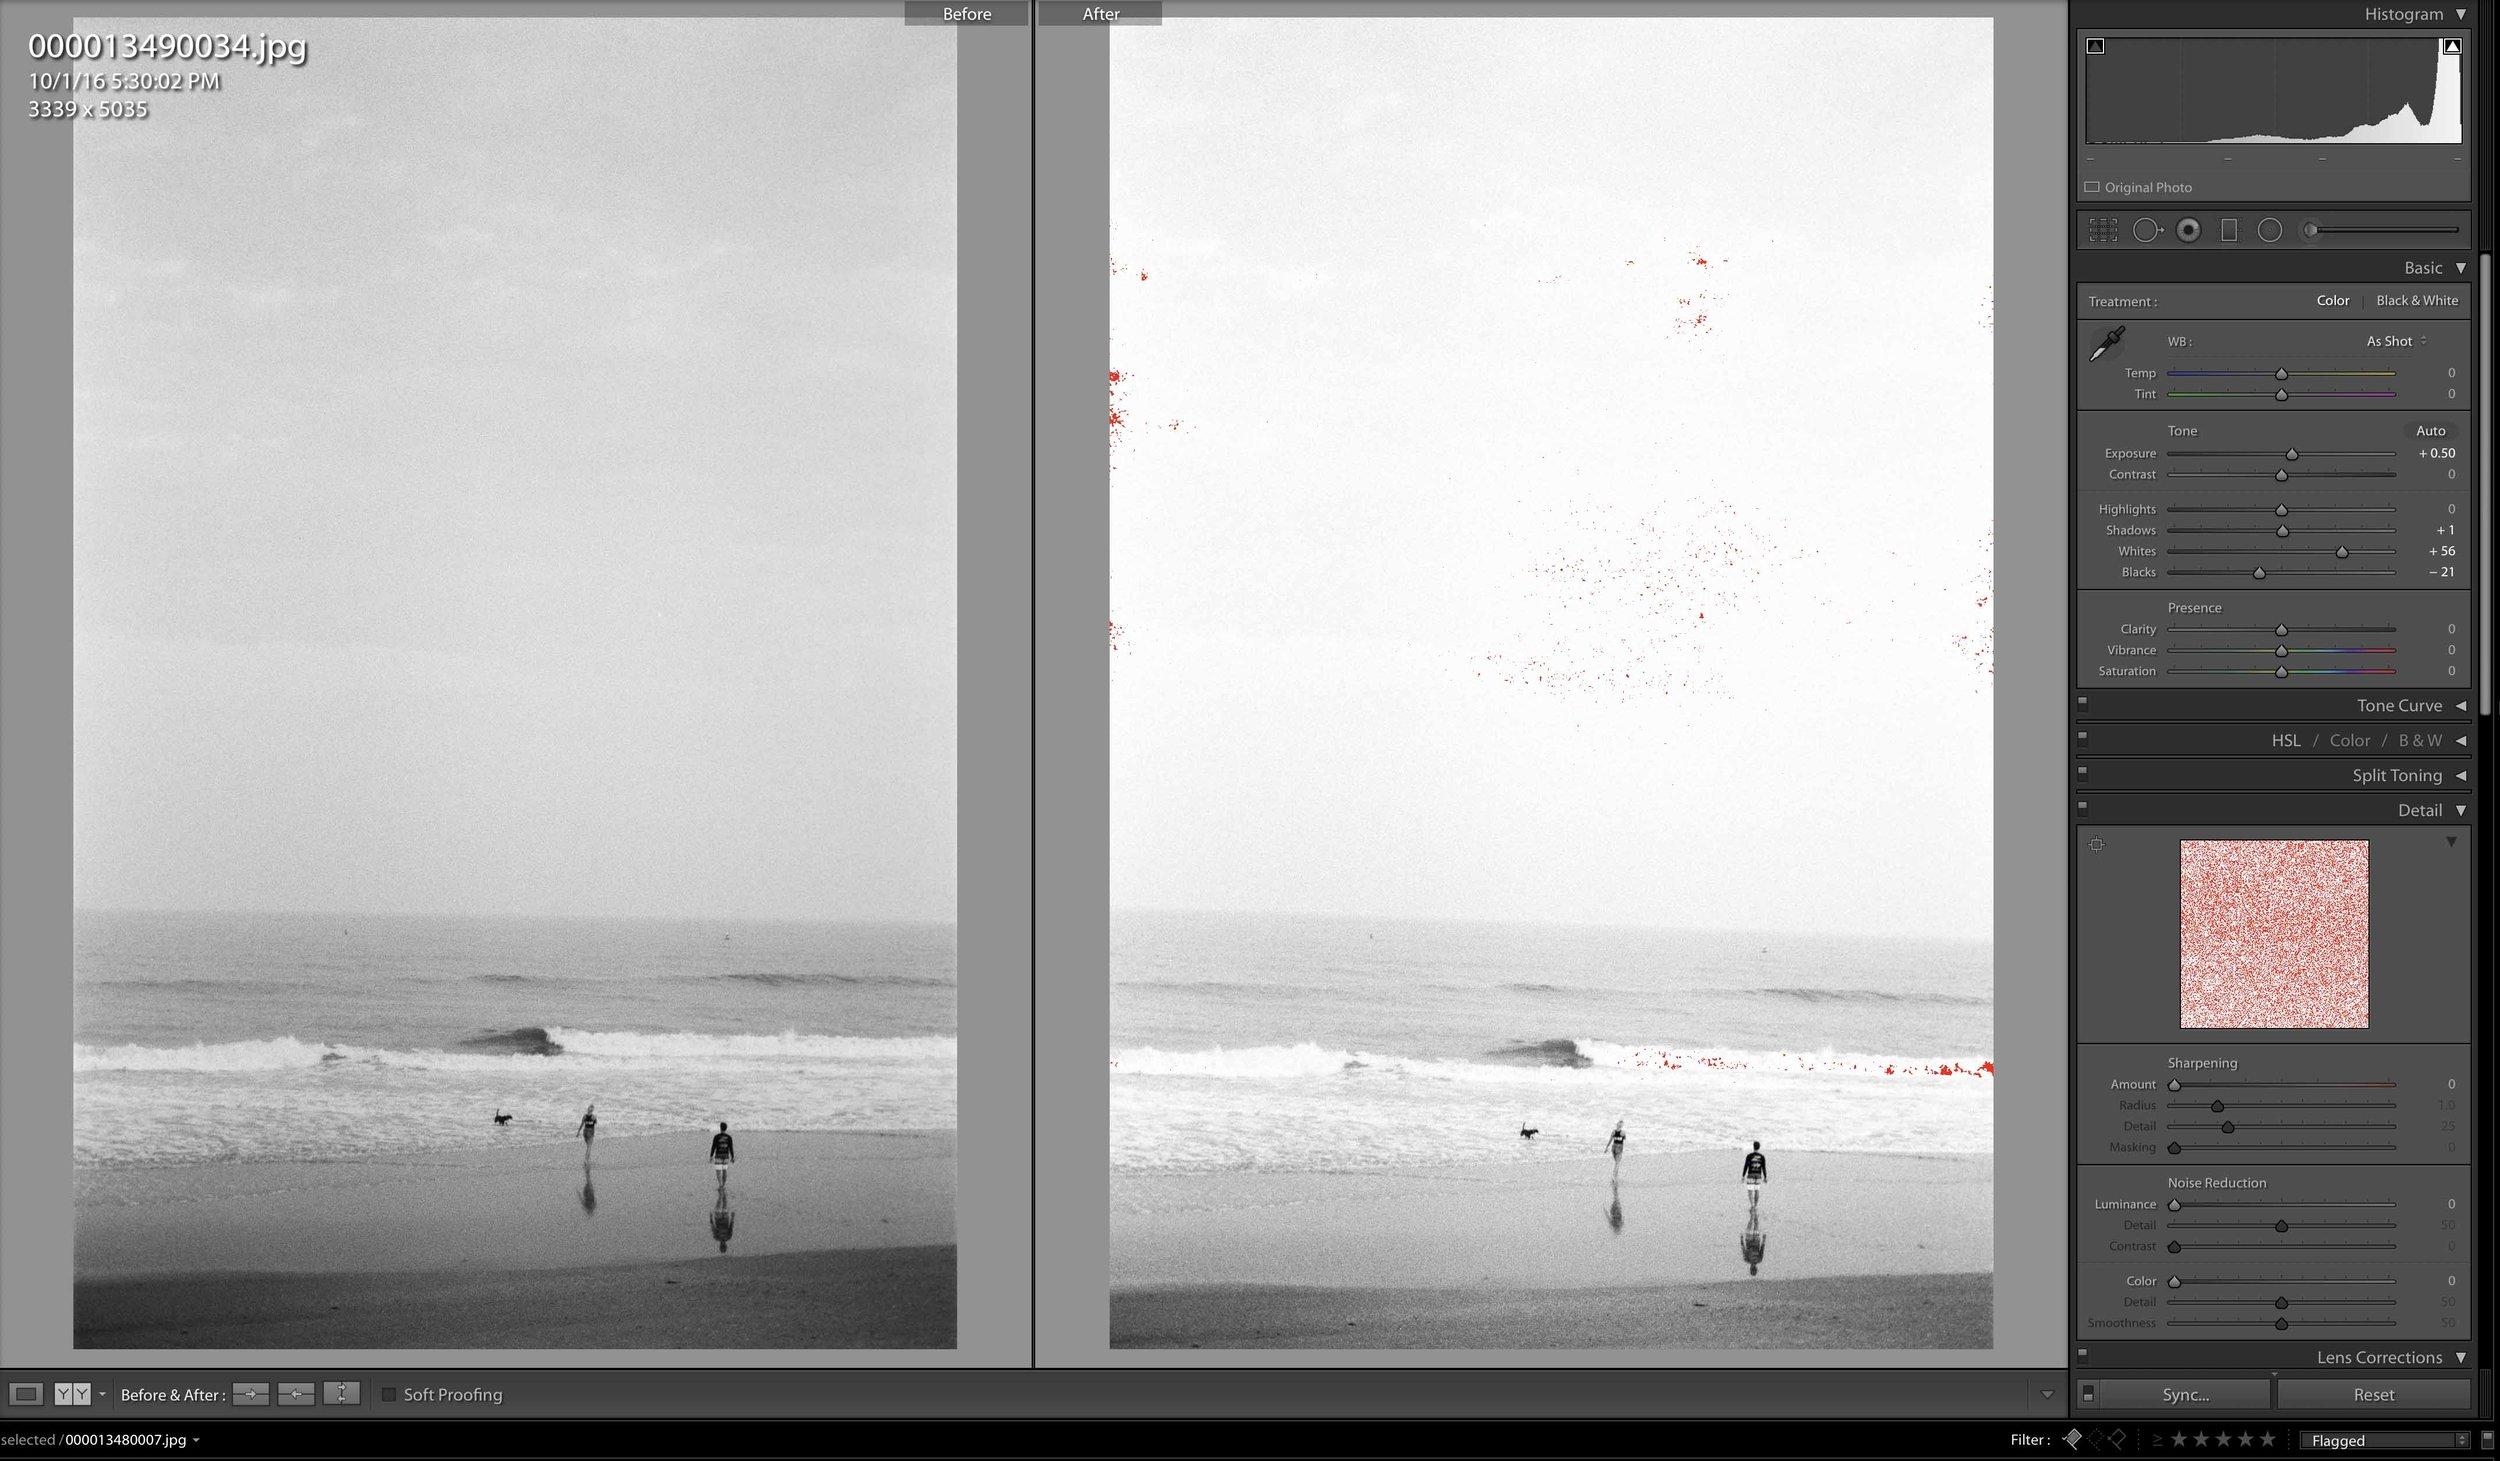 Leica M6, Summicron-M 50mm f/2, Kodak Tri-X 400,Rated @ 200 ISO